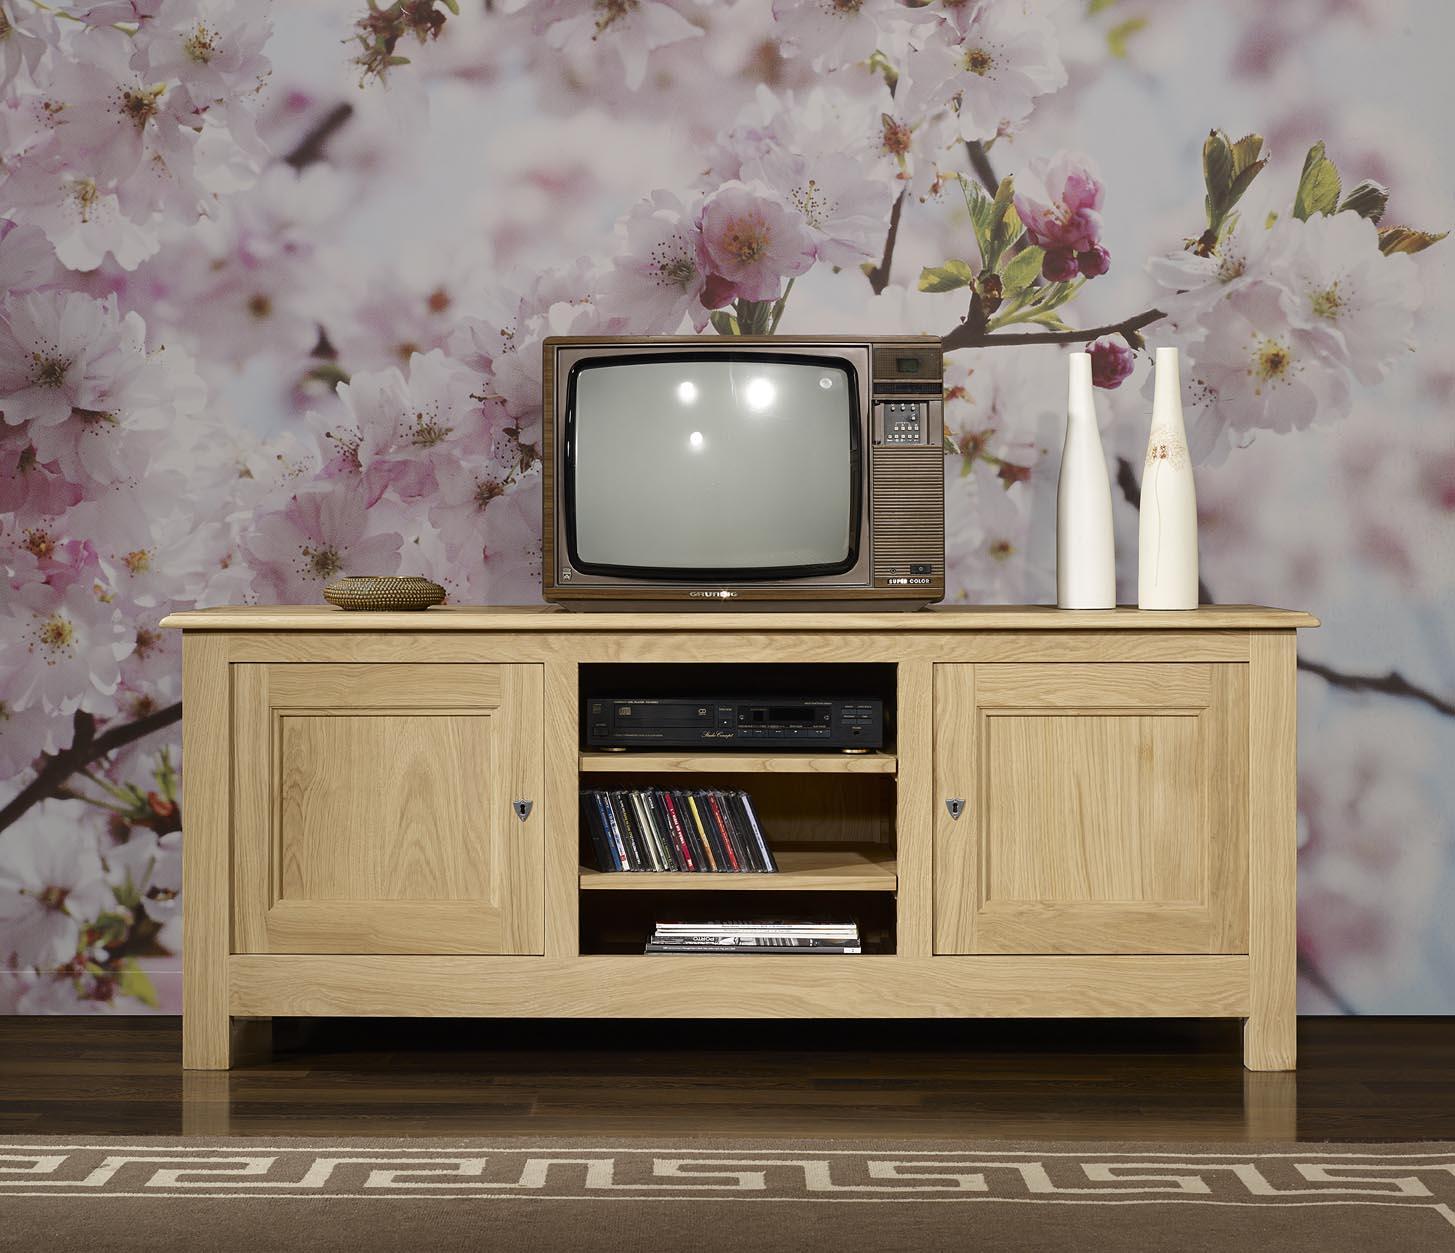 Meuble Tv 16 9eme Amaury En Ch Ne Massif De Style Campagnard  # Meuble Tv Naturel